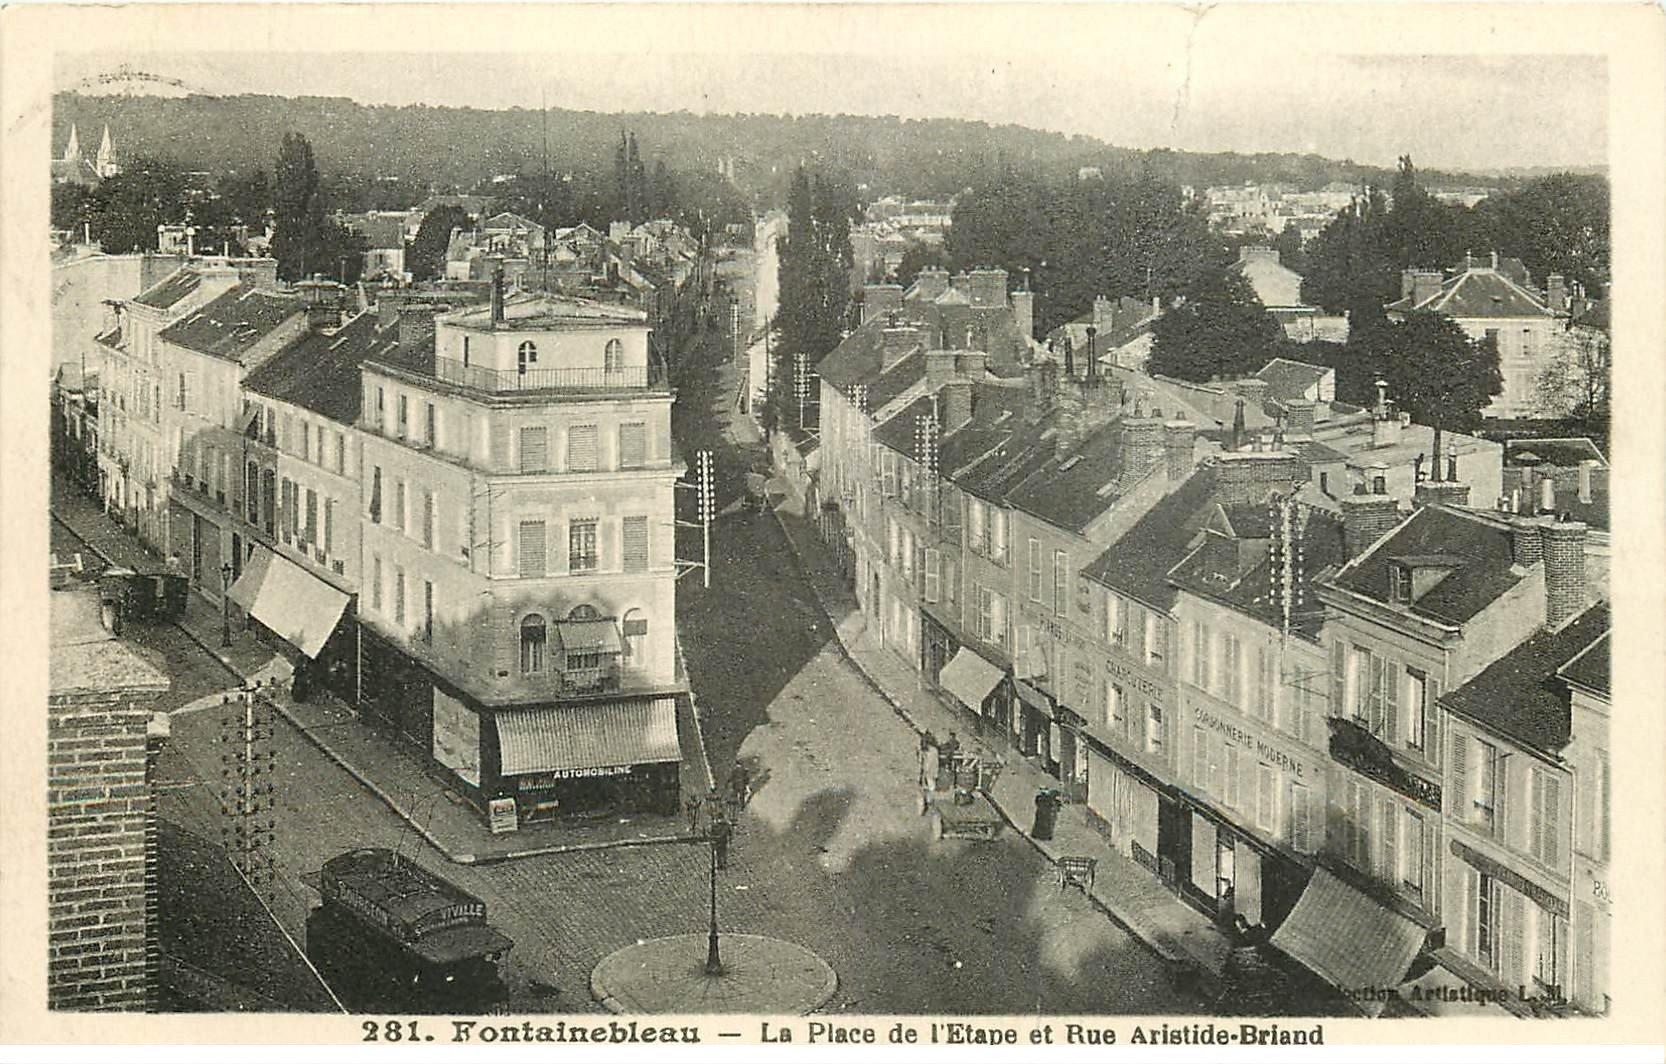 carte postale ancienne 77 FONTAINEBLEAU. Place de l'Etape rue Aristide Briand 1945. Fine plissure transversale